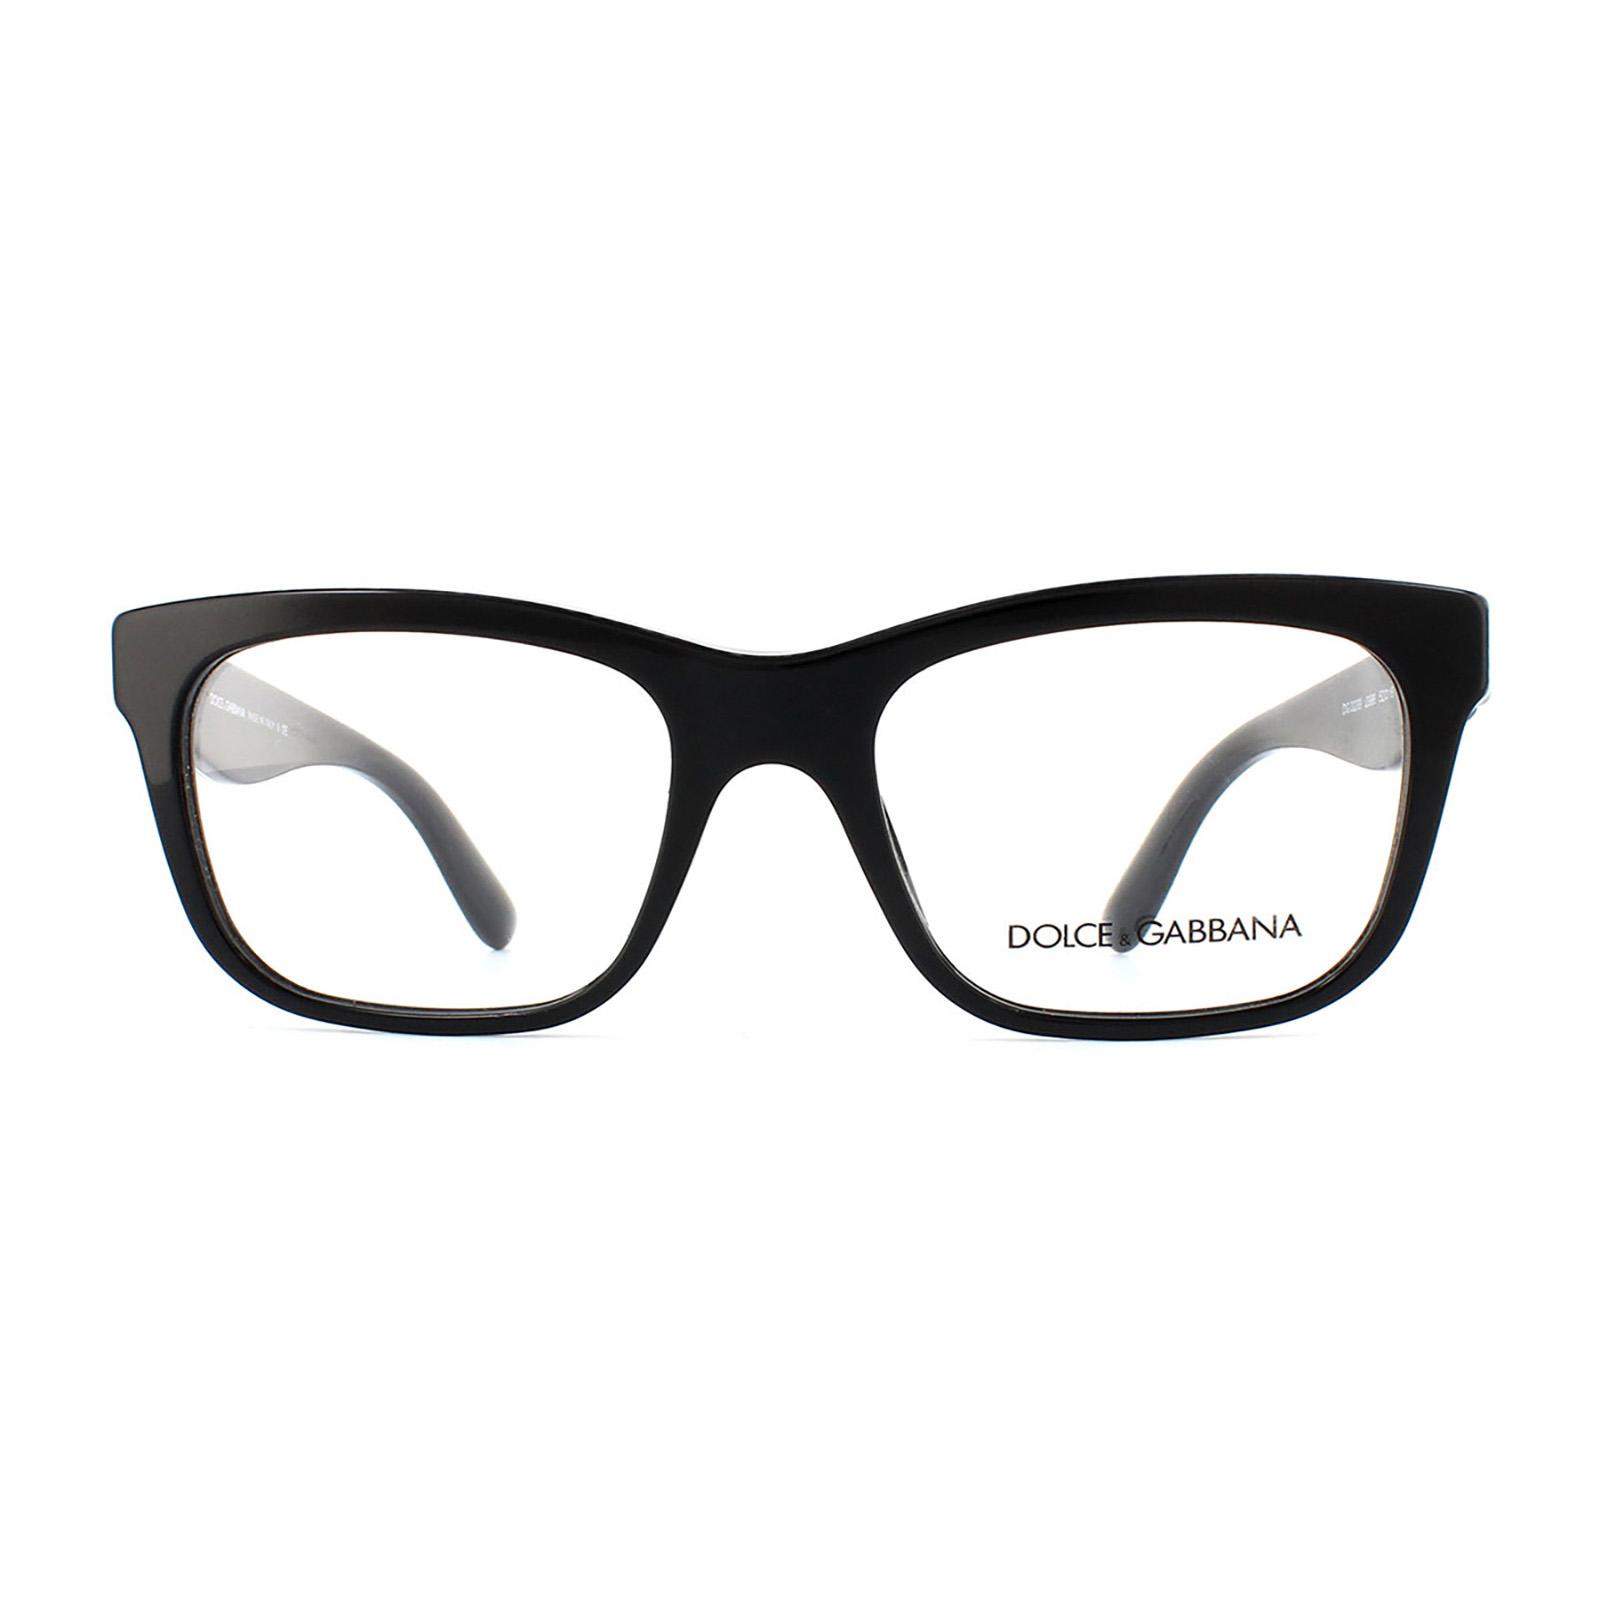 fa3cc694a18e Sentinel Dolce and Gabbana Glasses Frames 3239 2998 Top Black Texture  Tissue Womens 52mm